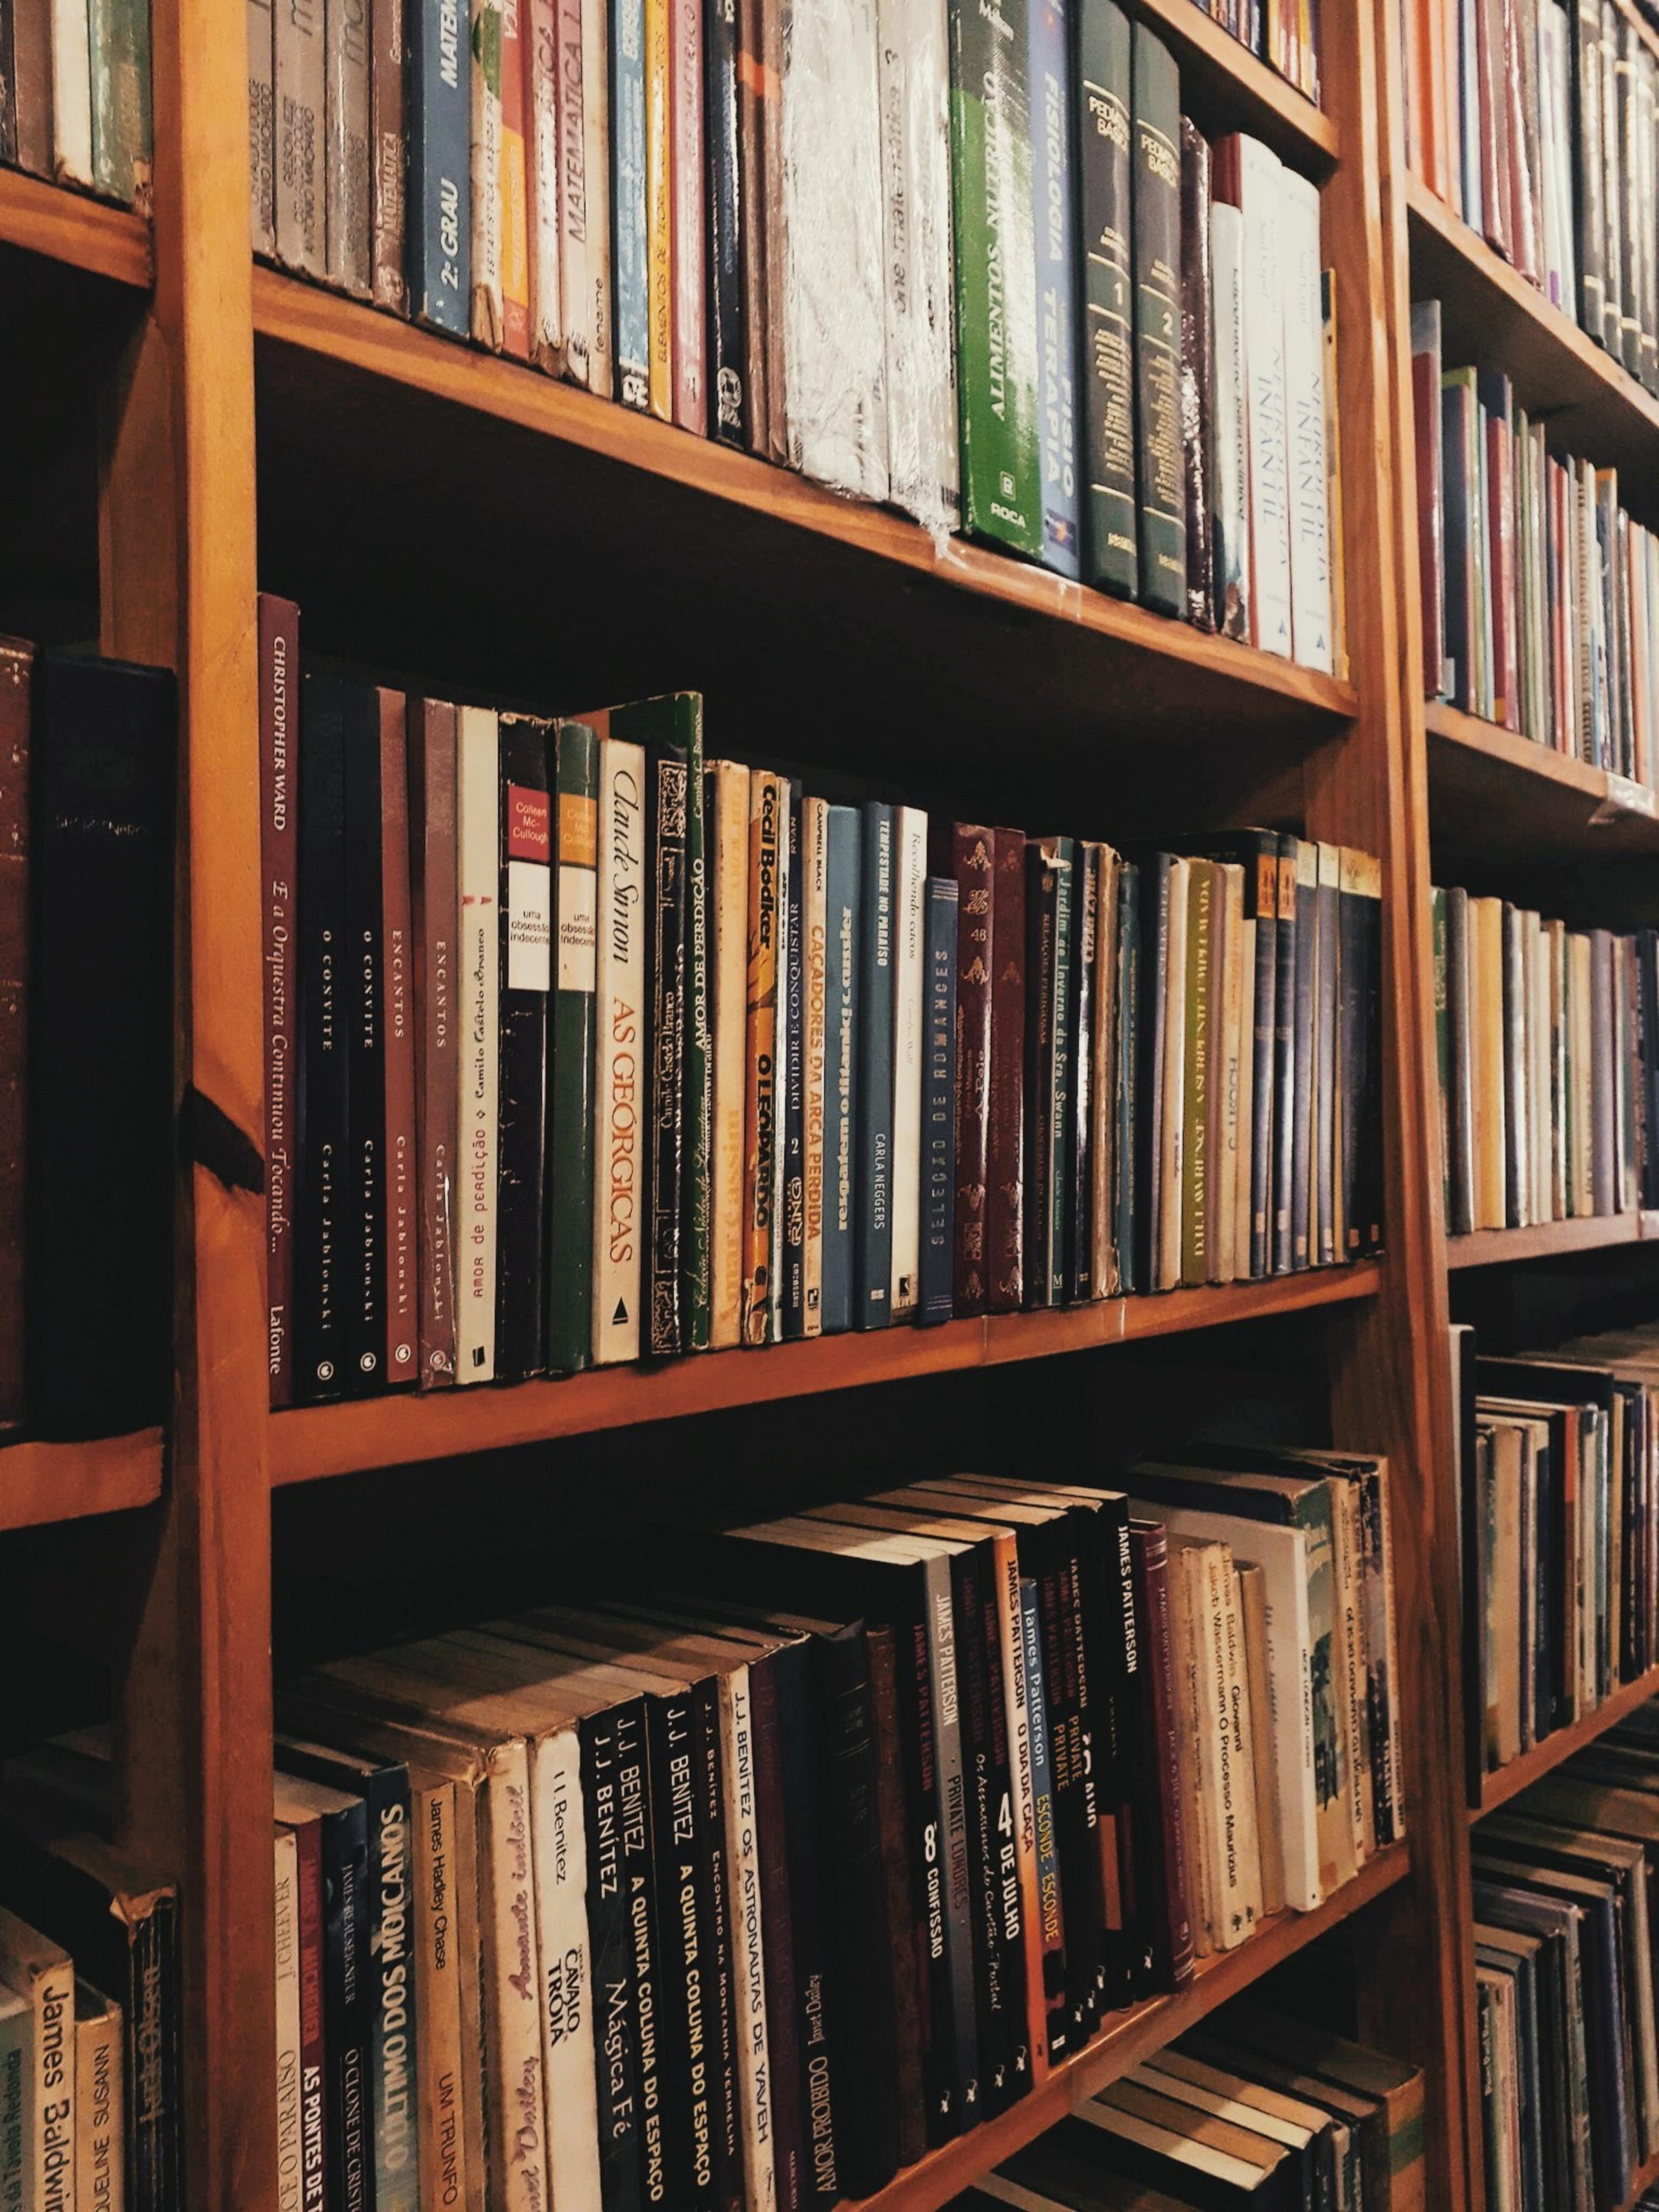 Close-up Photo of a Bookshelf Full of Books